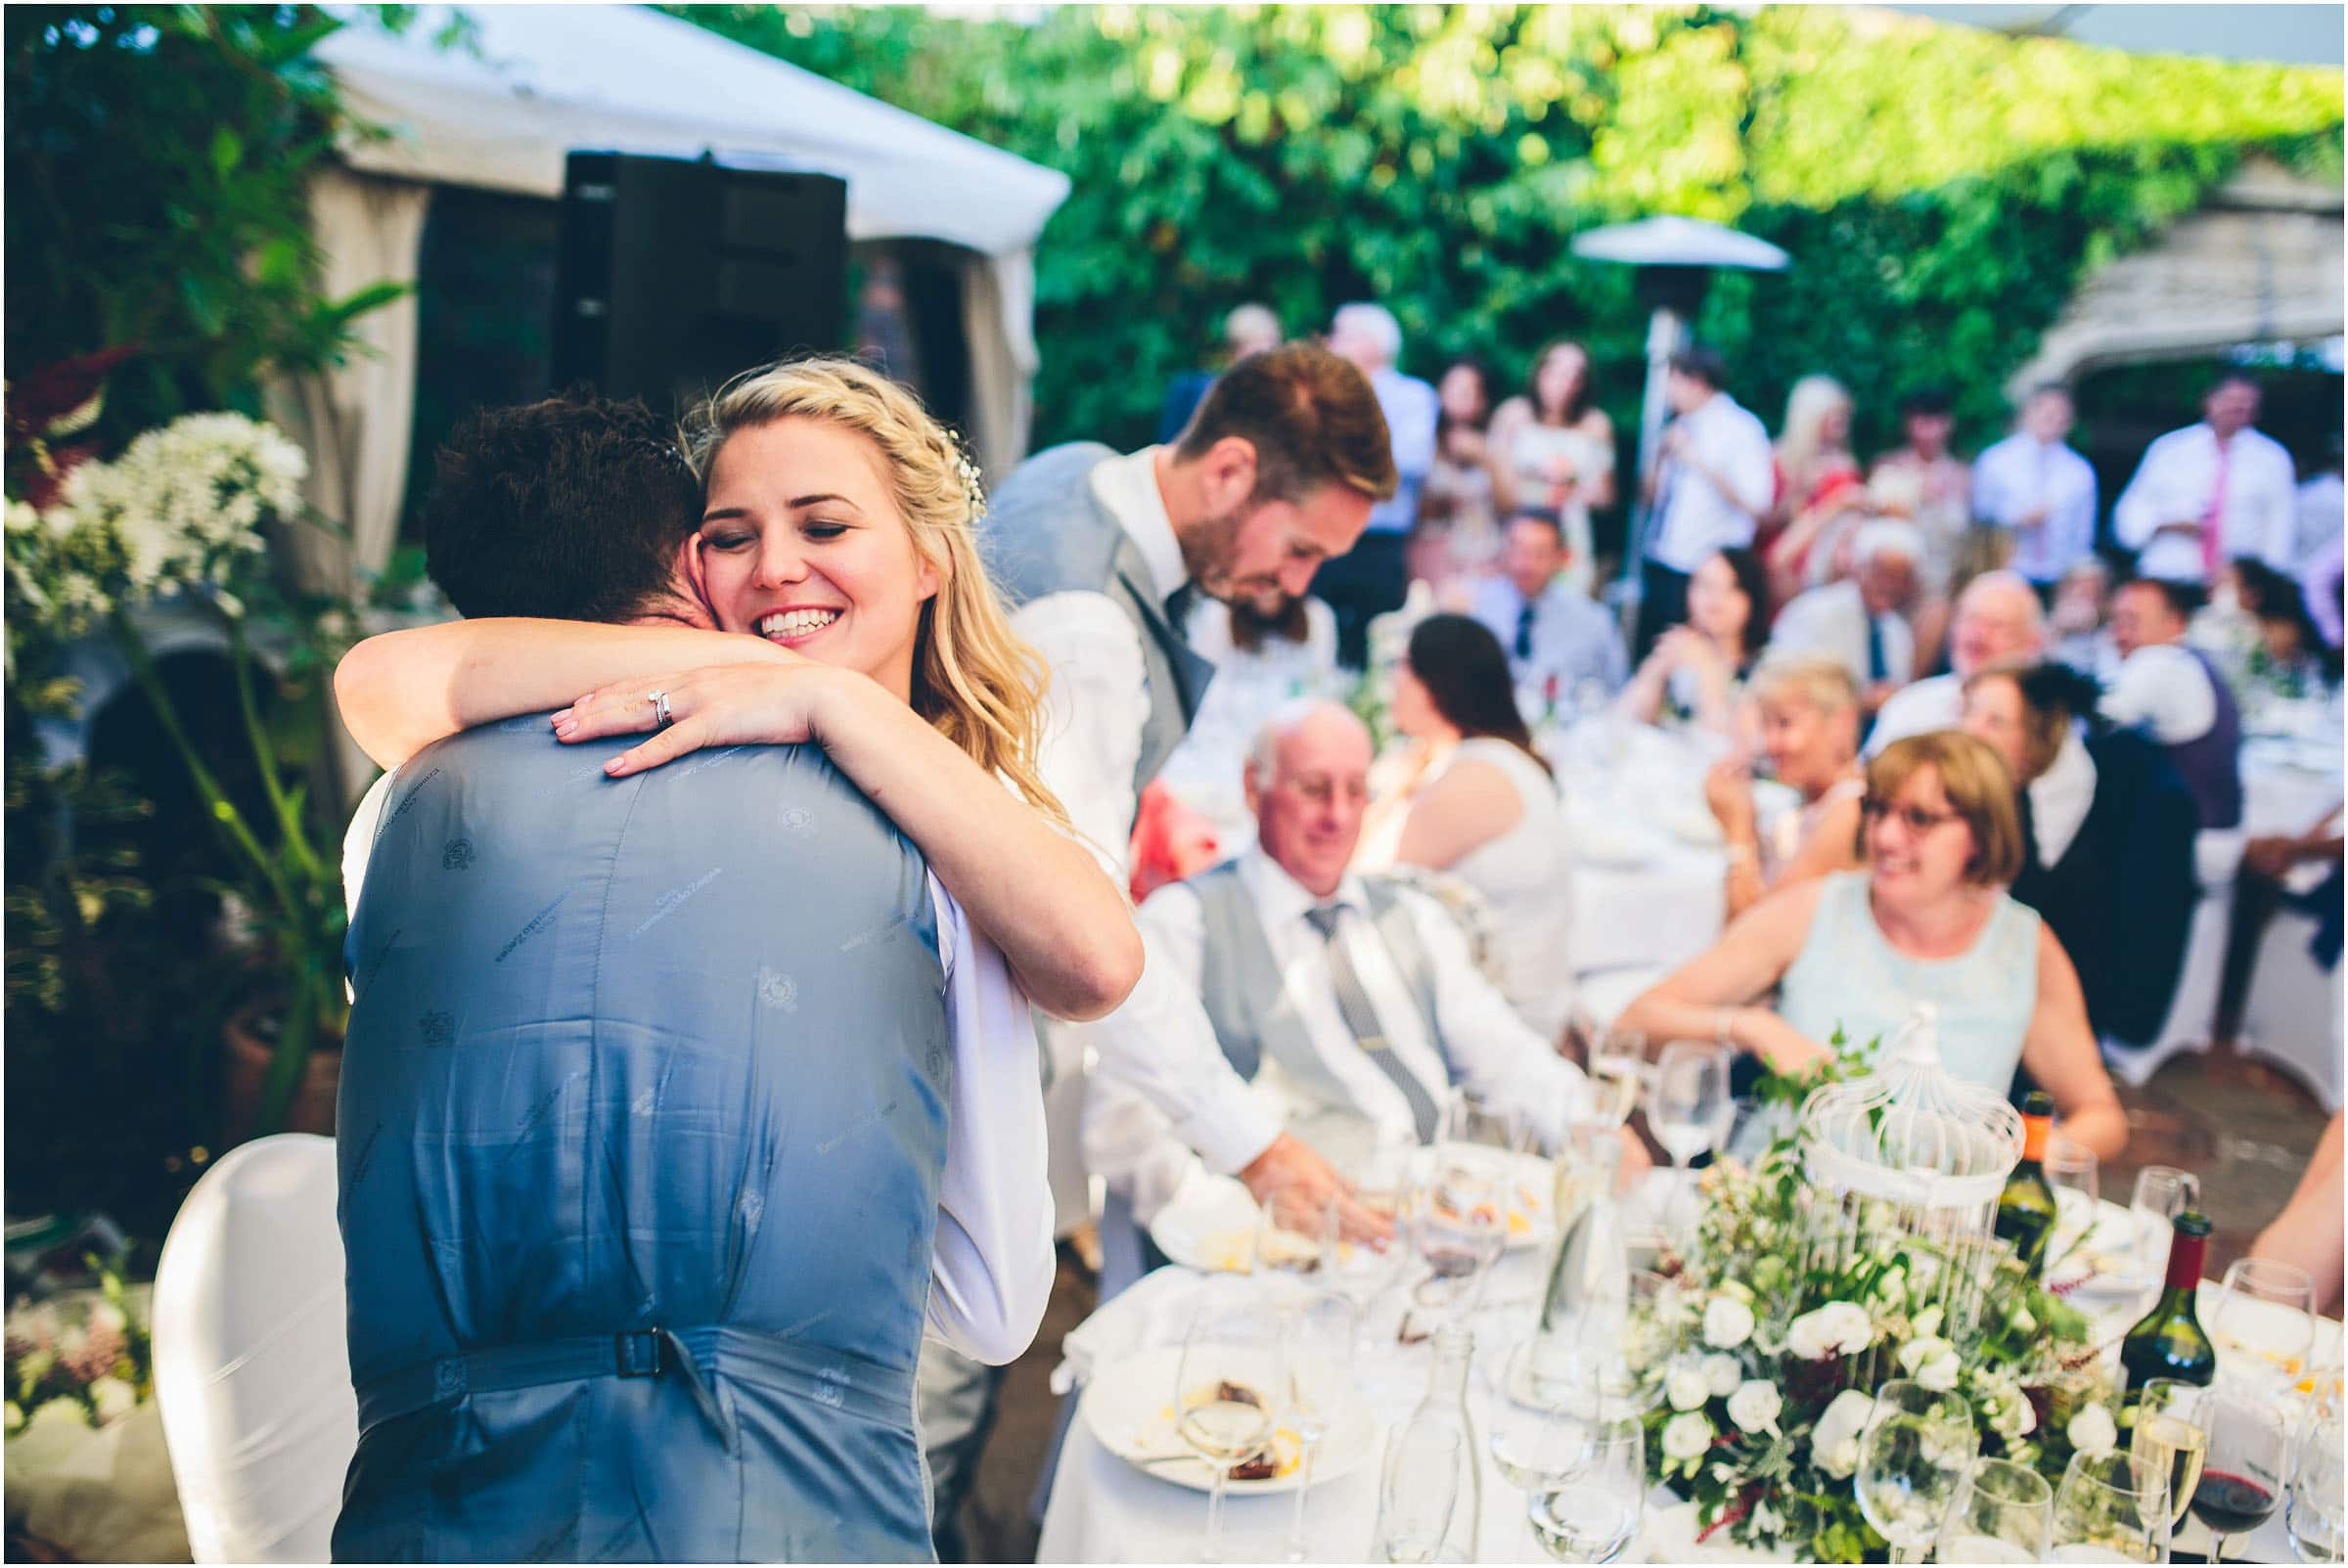 Kensington_Roof_Gardens_Wedding_Photography_0107